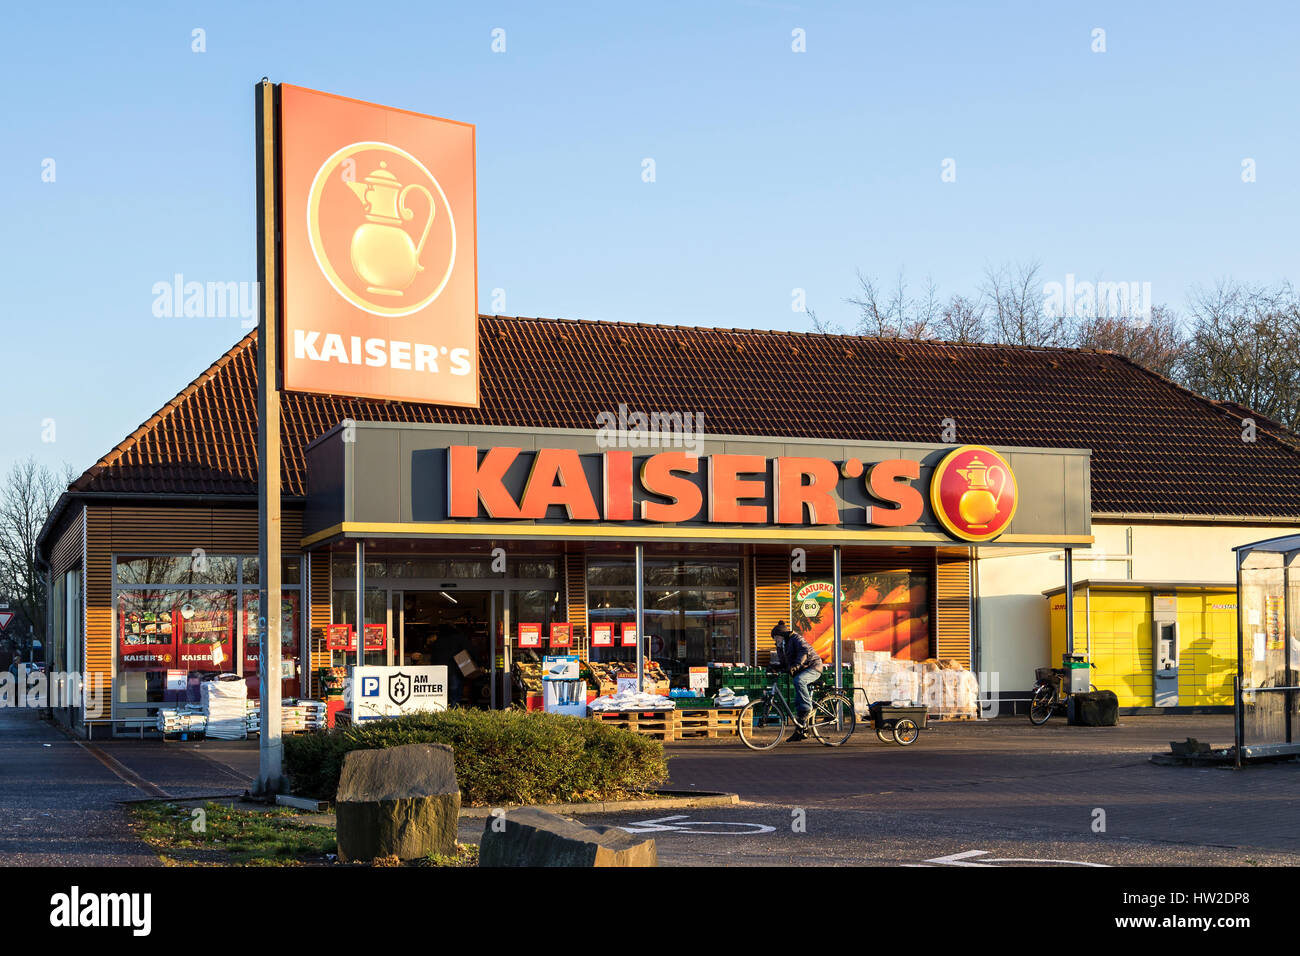 Verkauf Kaisers An Edeka Aktuell